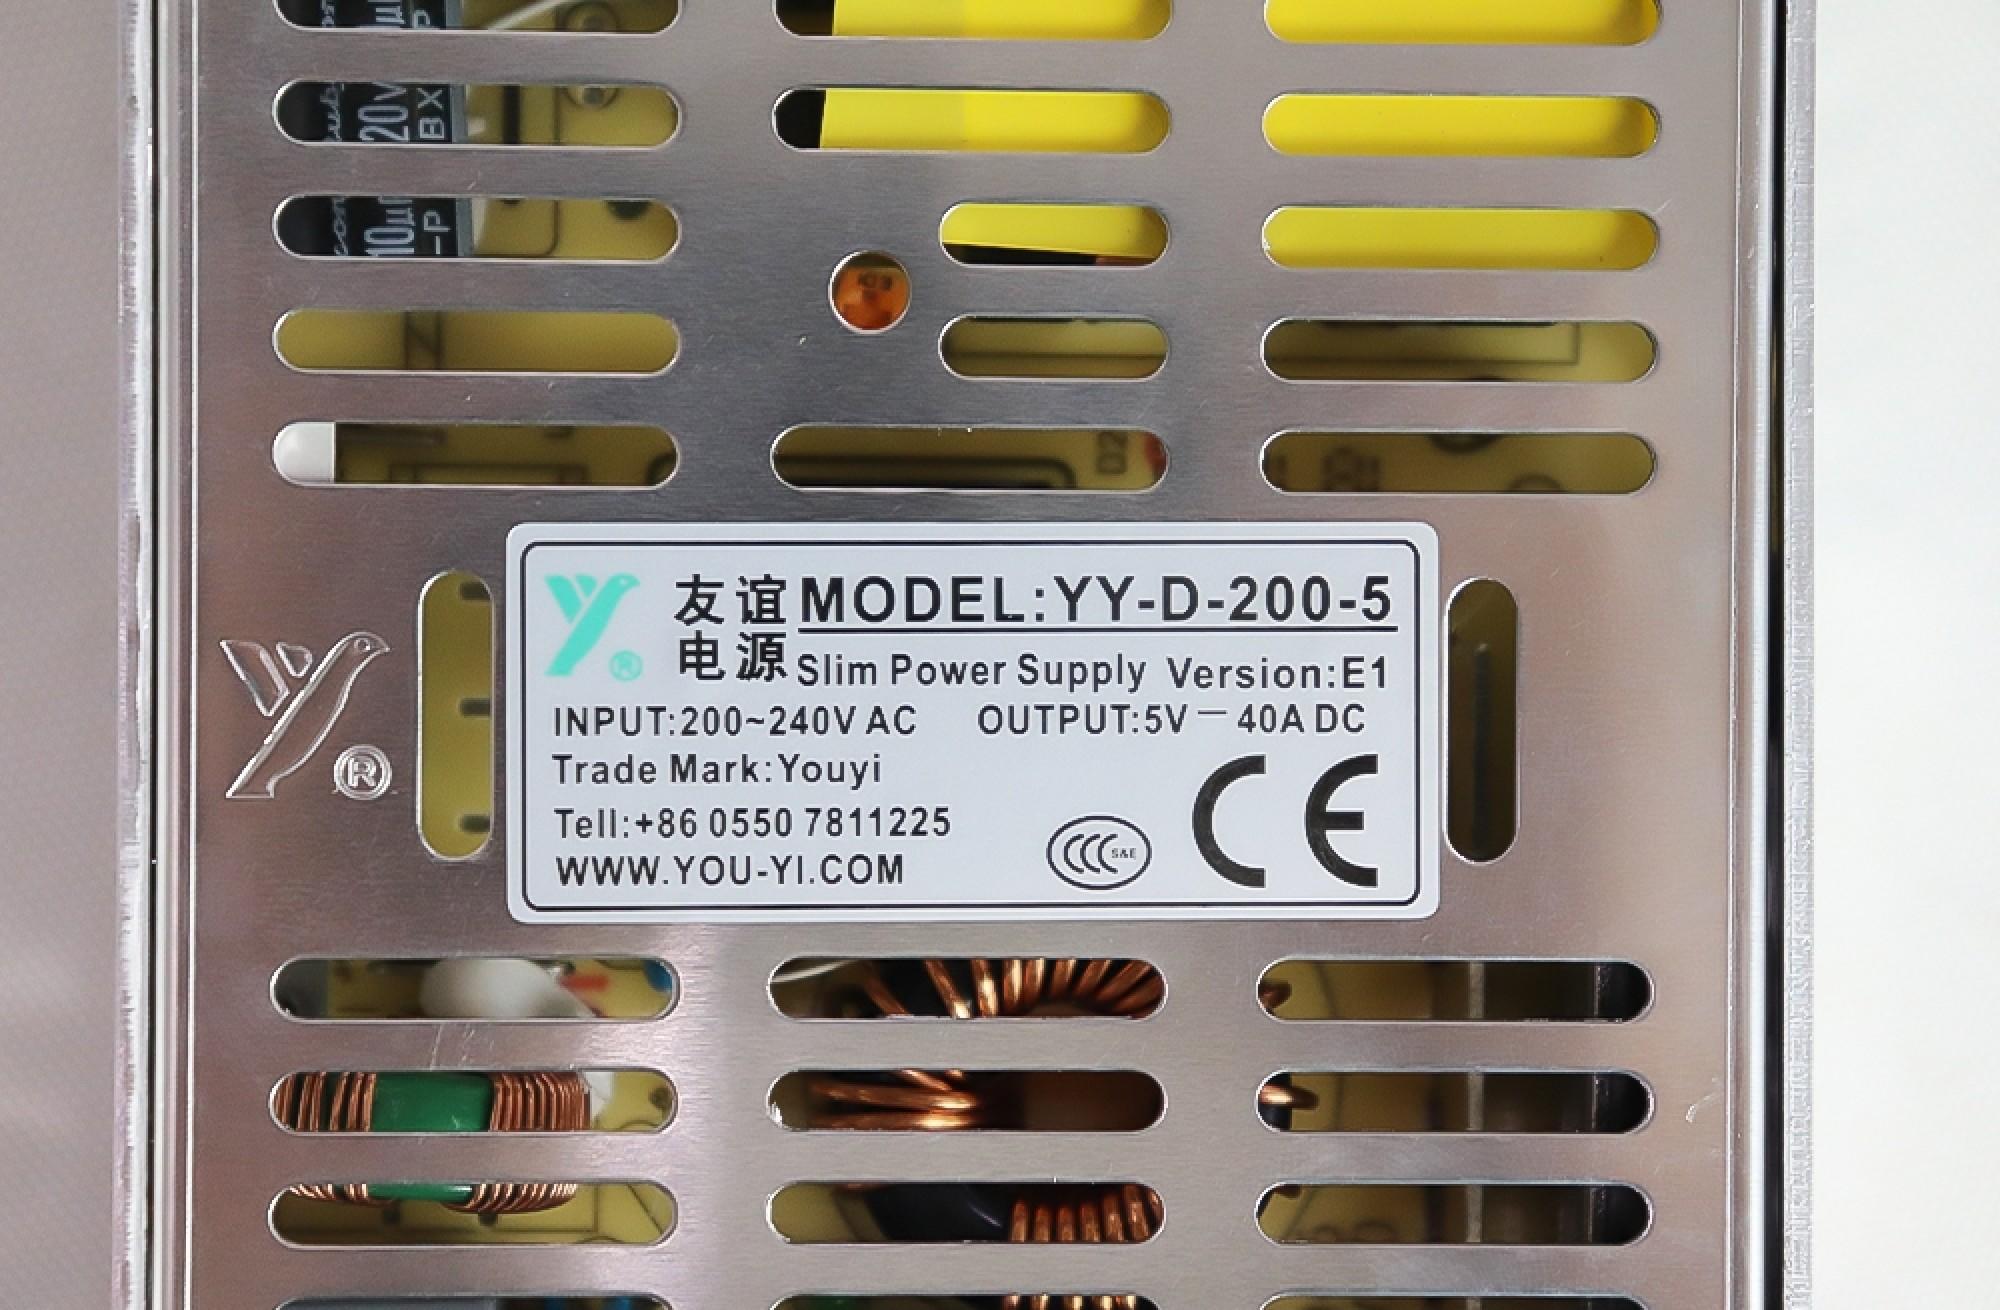 YOU-YI YY-D-200-5 5V40A 200W LED Power Supply